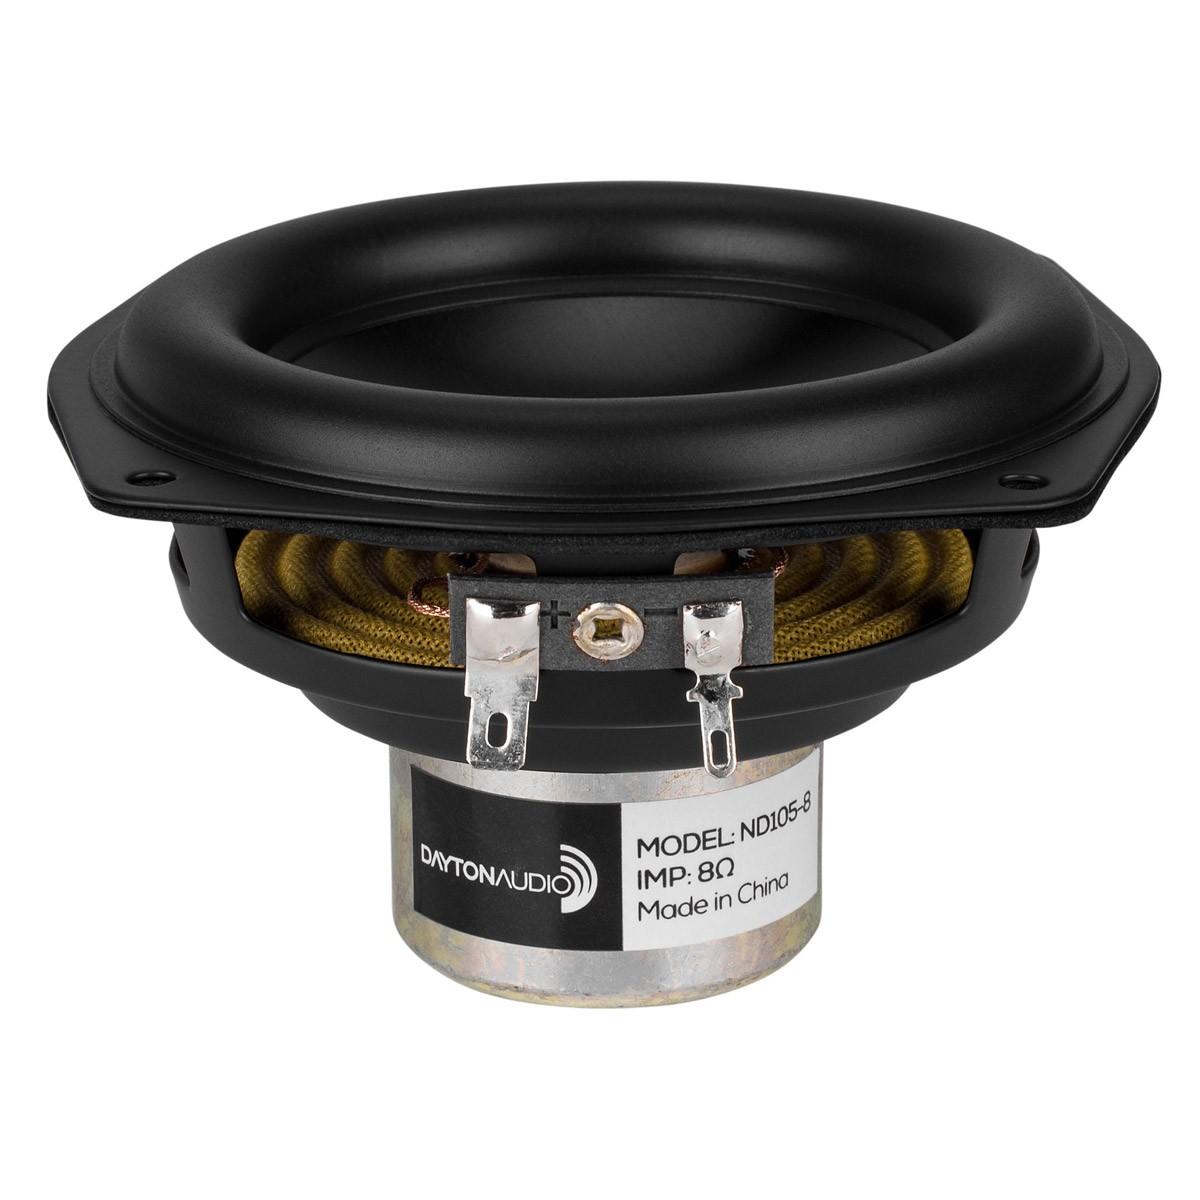 DAYTON AUDIO ND105-8 Haut-Parleur Bas Médium Aluminium 30W 8 Ohm 83dB 60Hz - 10kHz Ø10.2cm